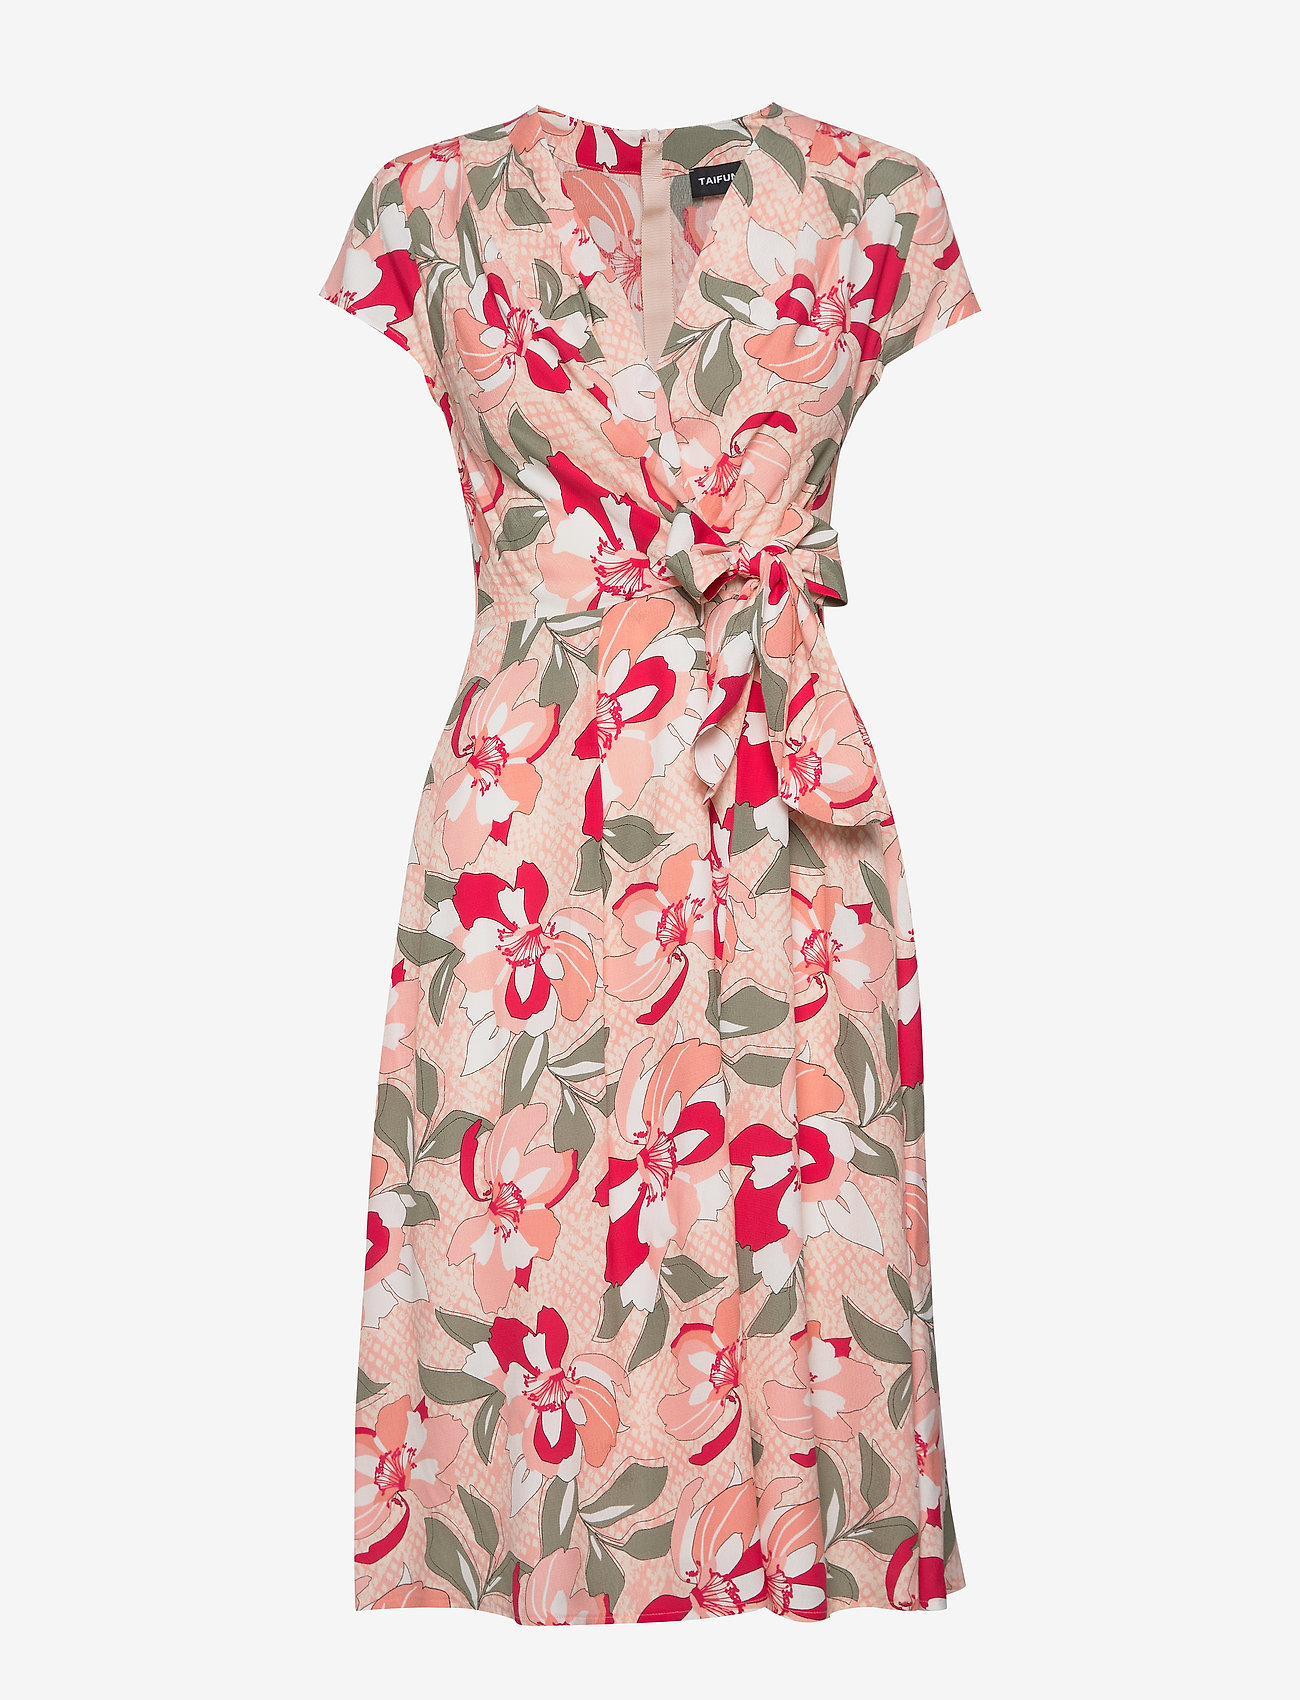 Taifun - DRESS WOVEN FABRIC - midiklänningar - apricot blush patterned - 0